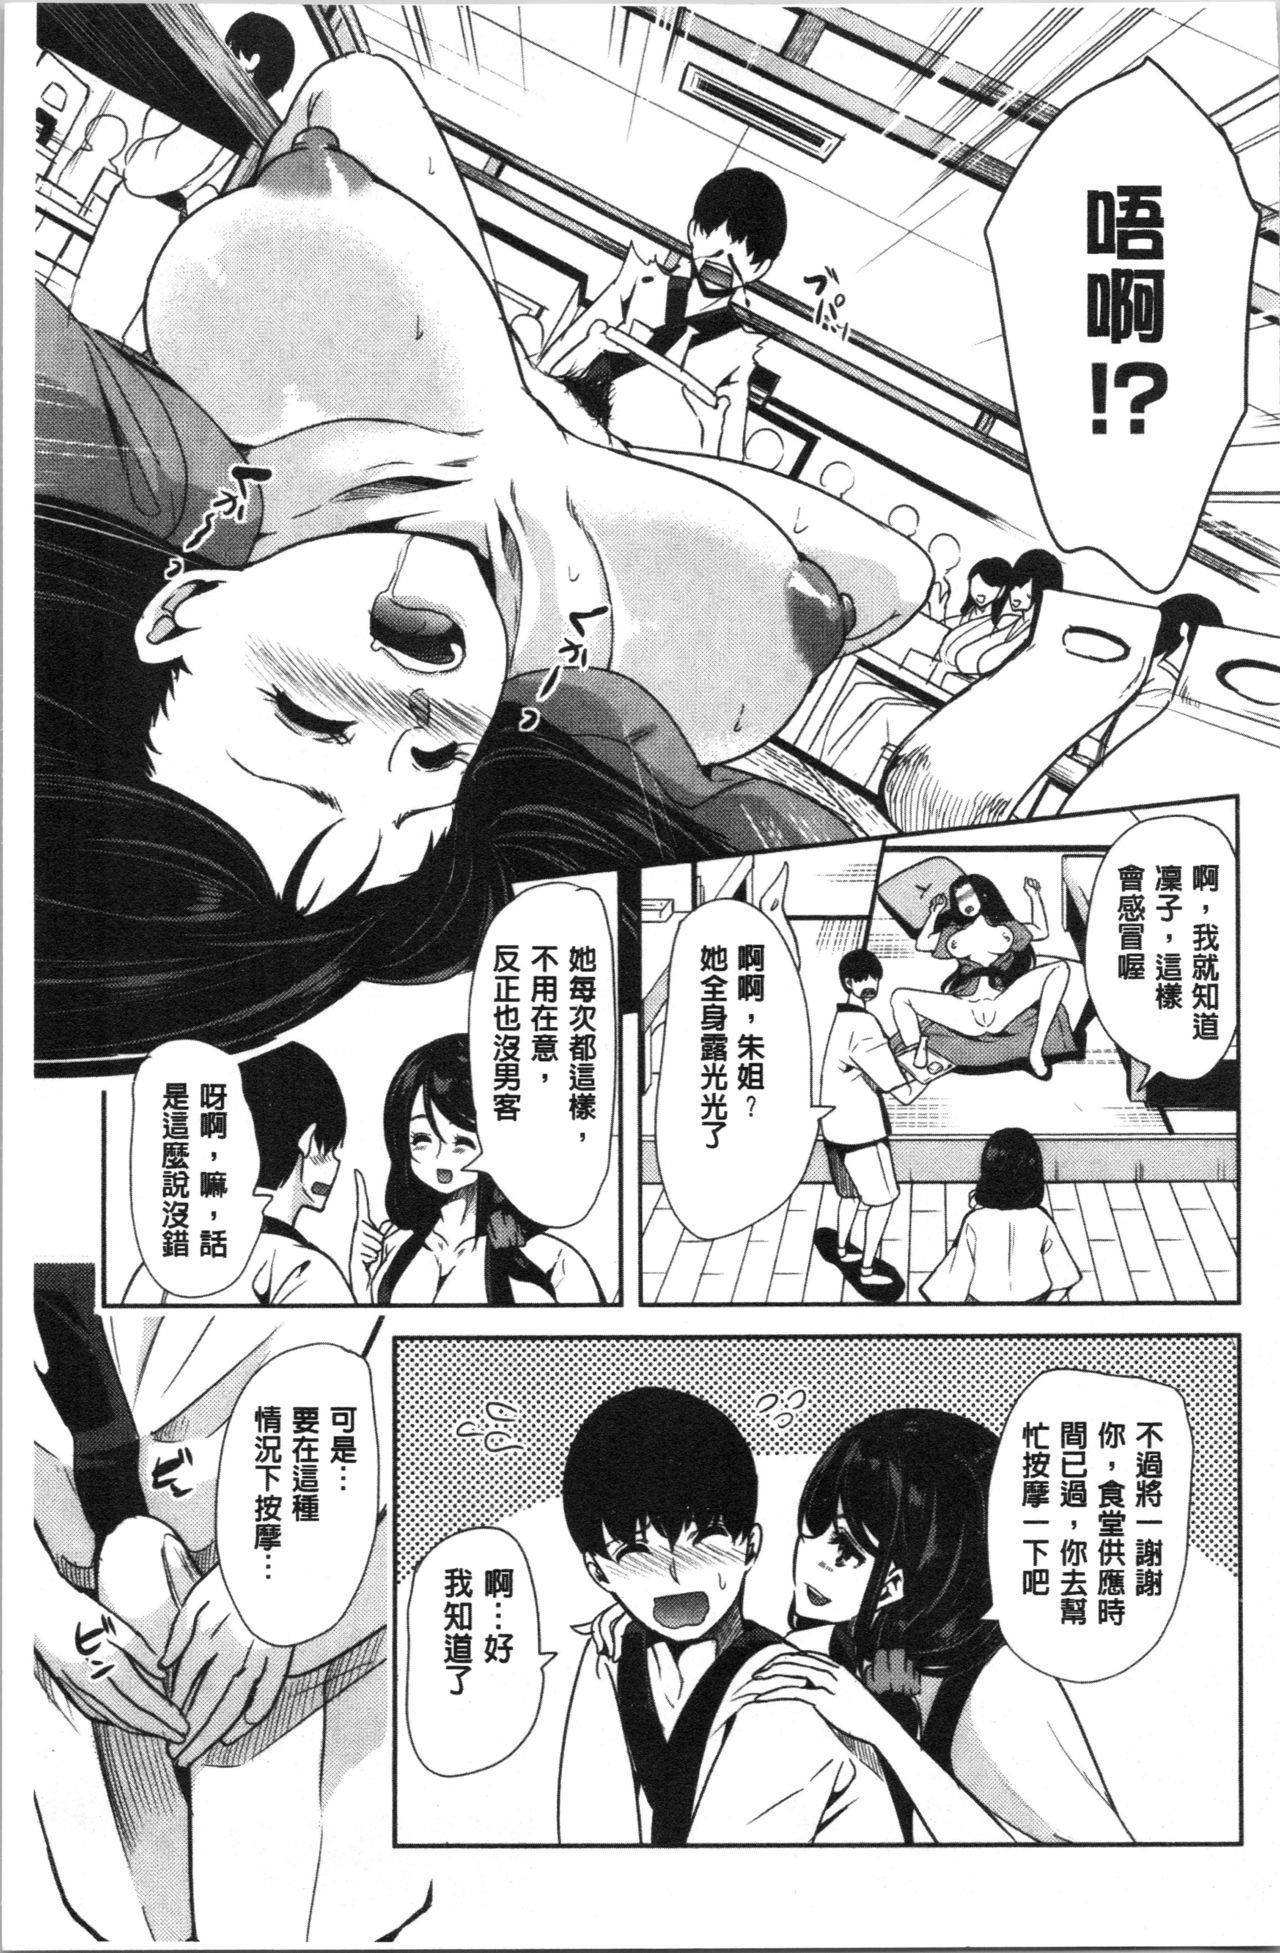 [Ootori Mahiro] Boku no Super Harem Sentou ~Otome no Naka ni Otoko wa Boku dake~ - My super harlem public bath, I am the only man in the public bath full of pussy cats. | 我的後宮選妃般的超級錢湯~乙女之間只有我一個男人~ [Chinese] 10